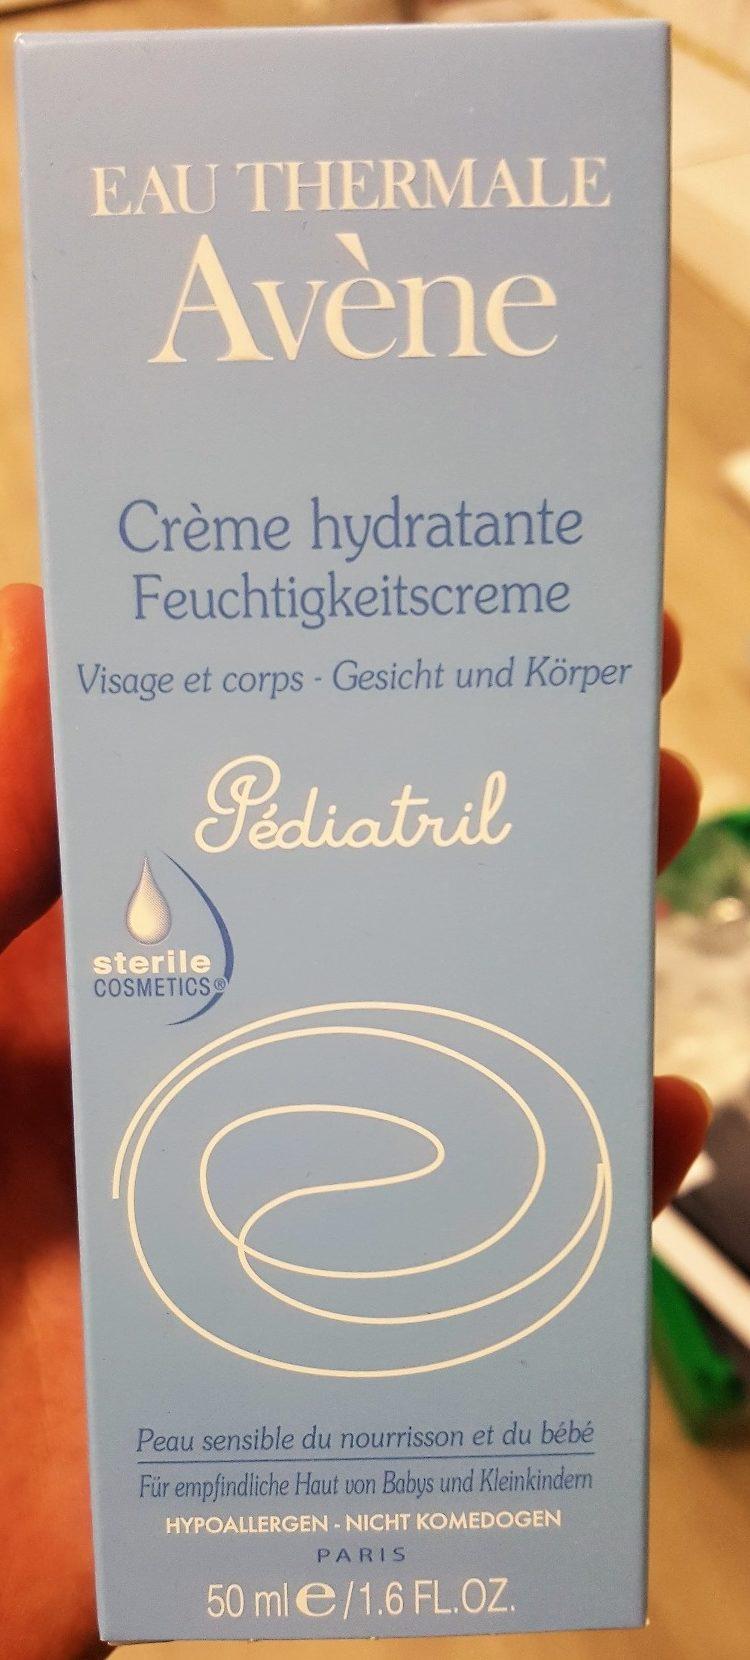 Crème Hydratante Avène Pédiatril Sterile Cosmetics - Product